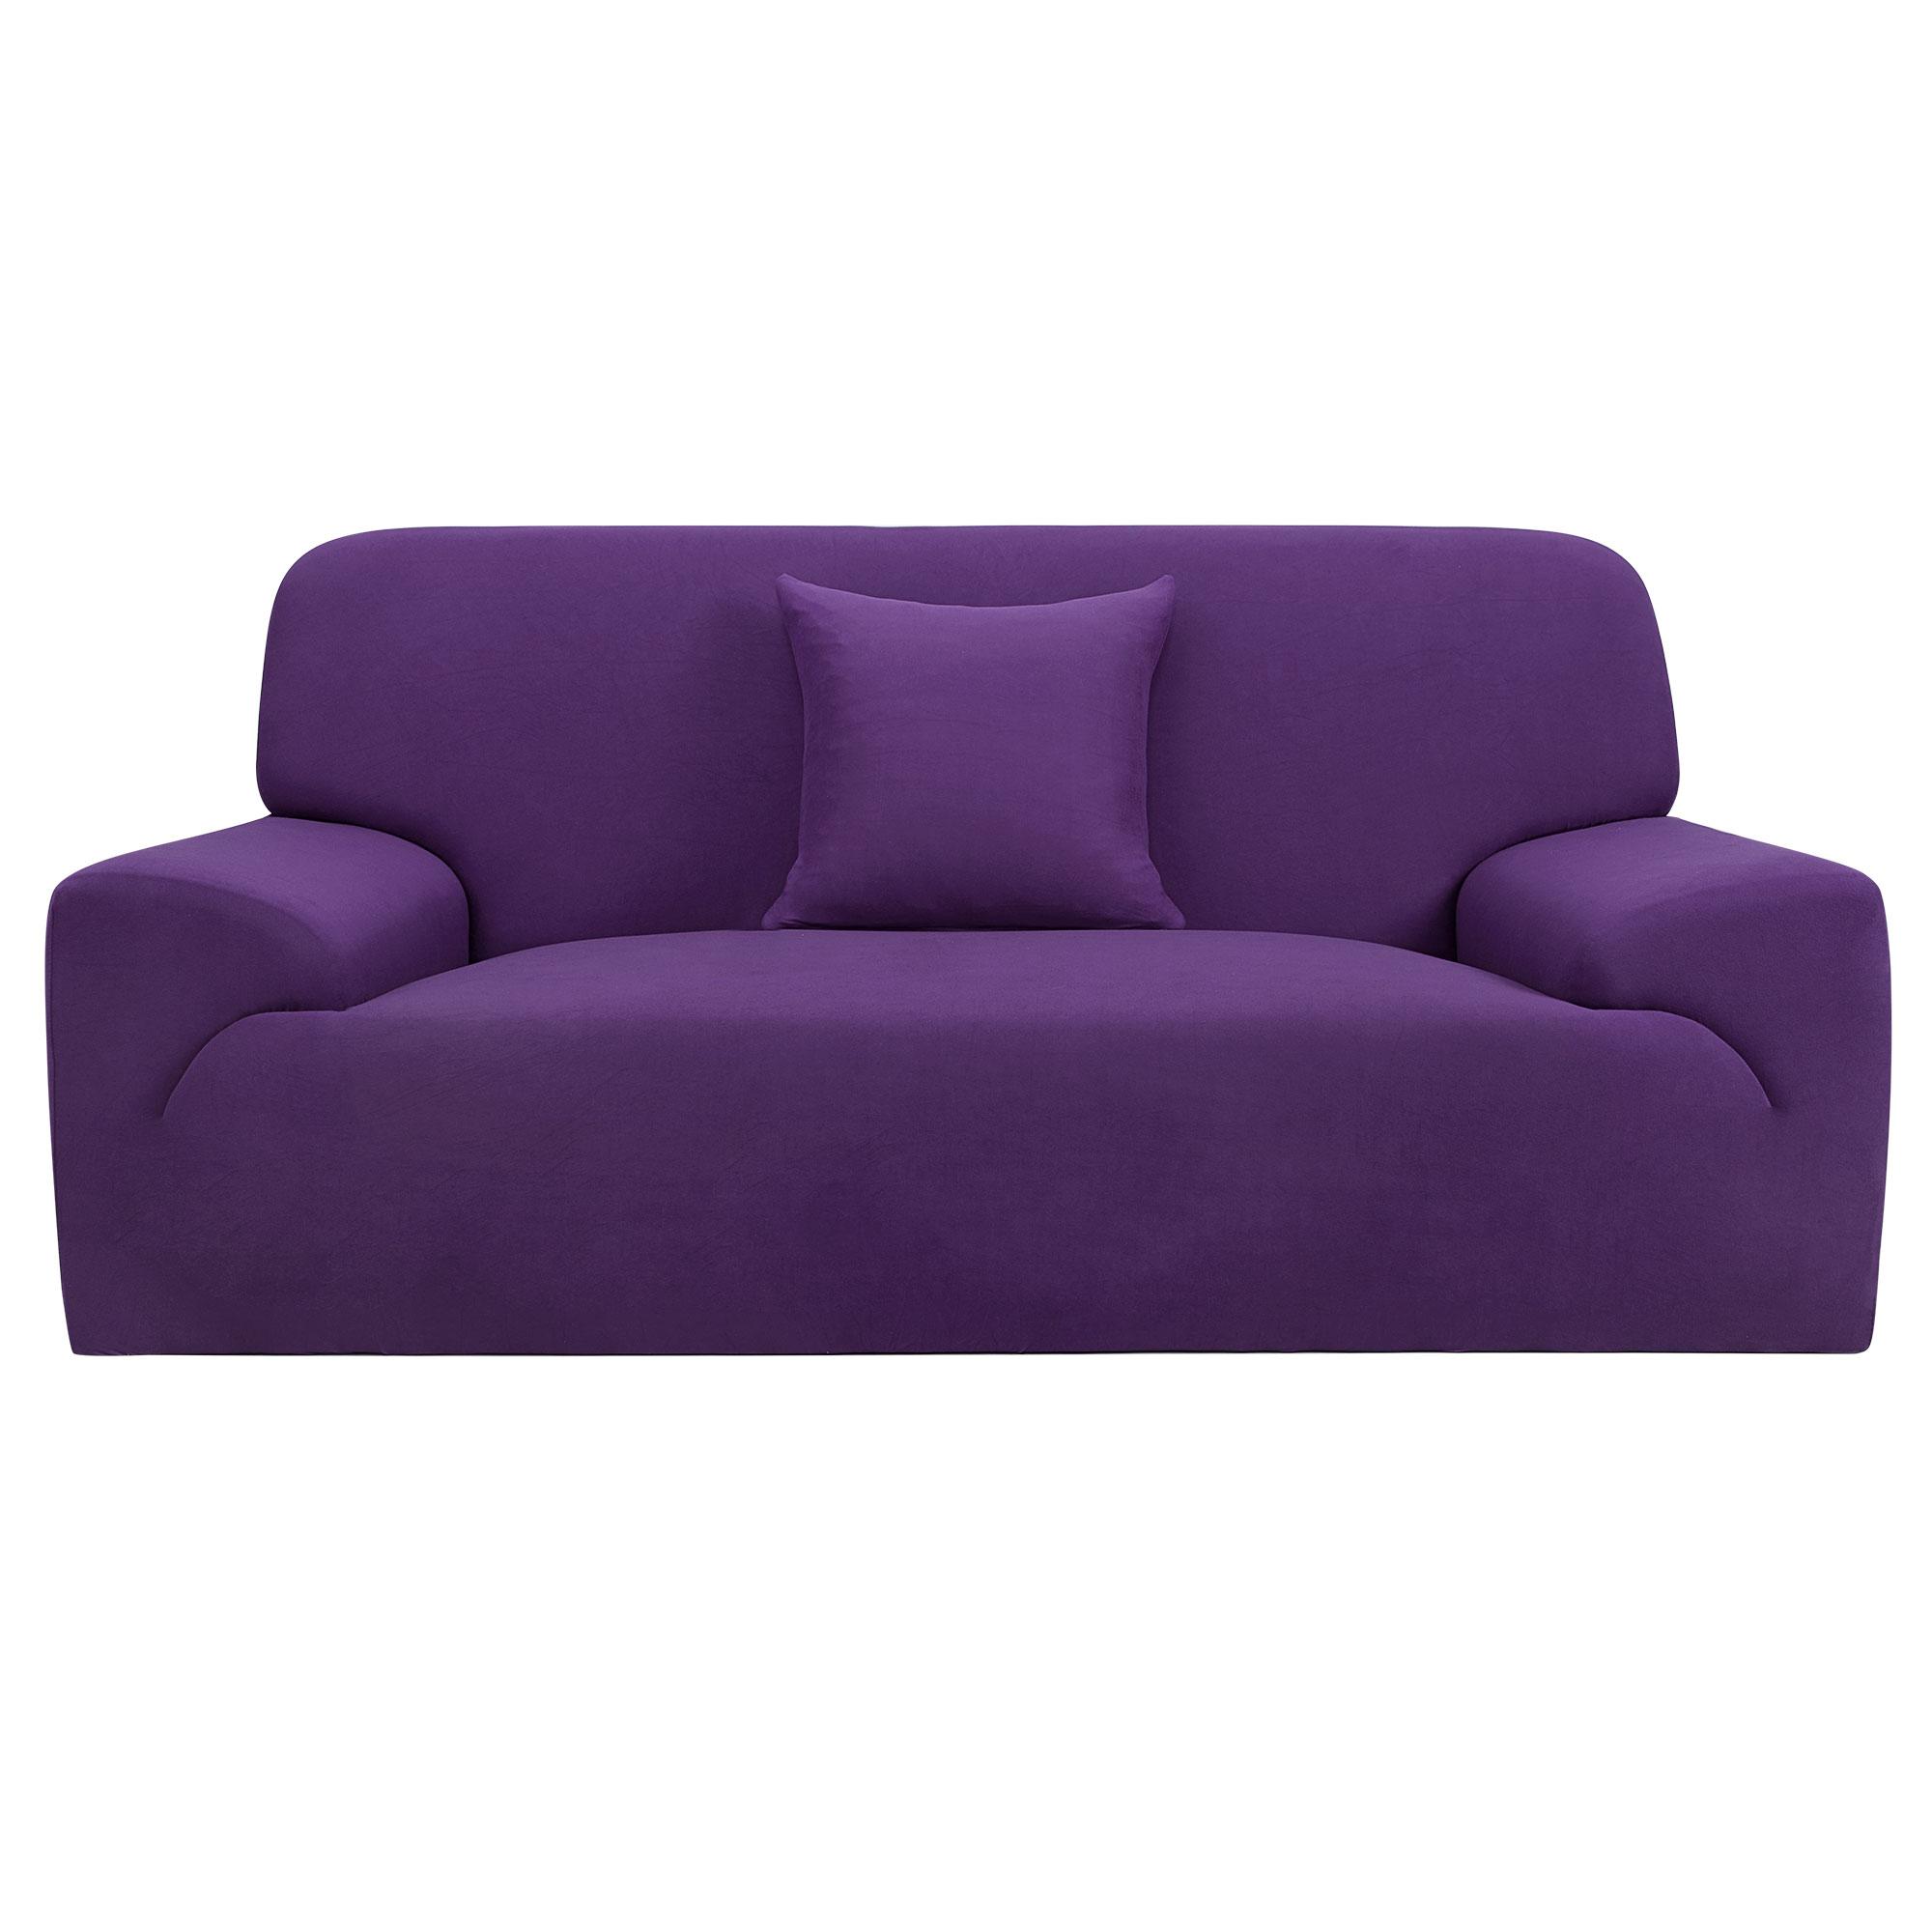 Household Furniture Sofa Elastic Cover Slipcover Protector Purple 74''-90''